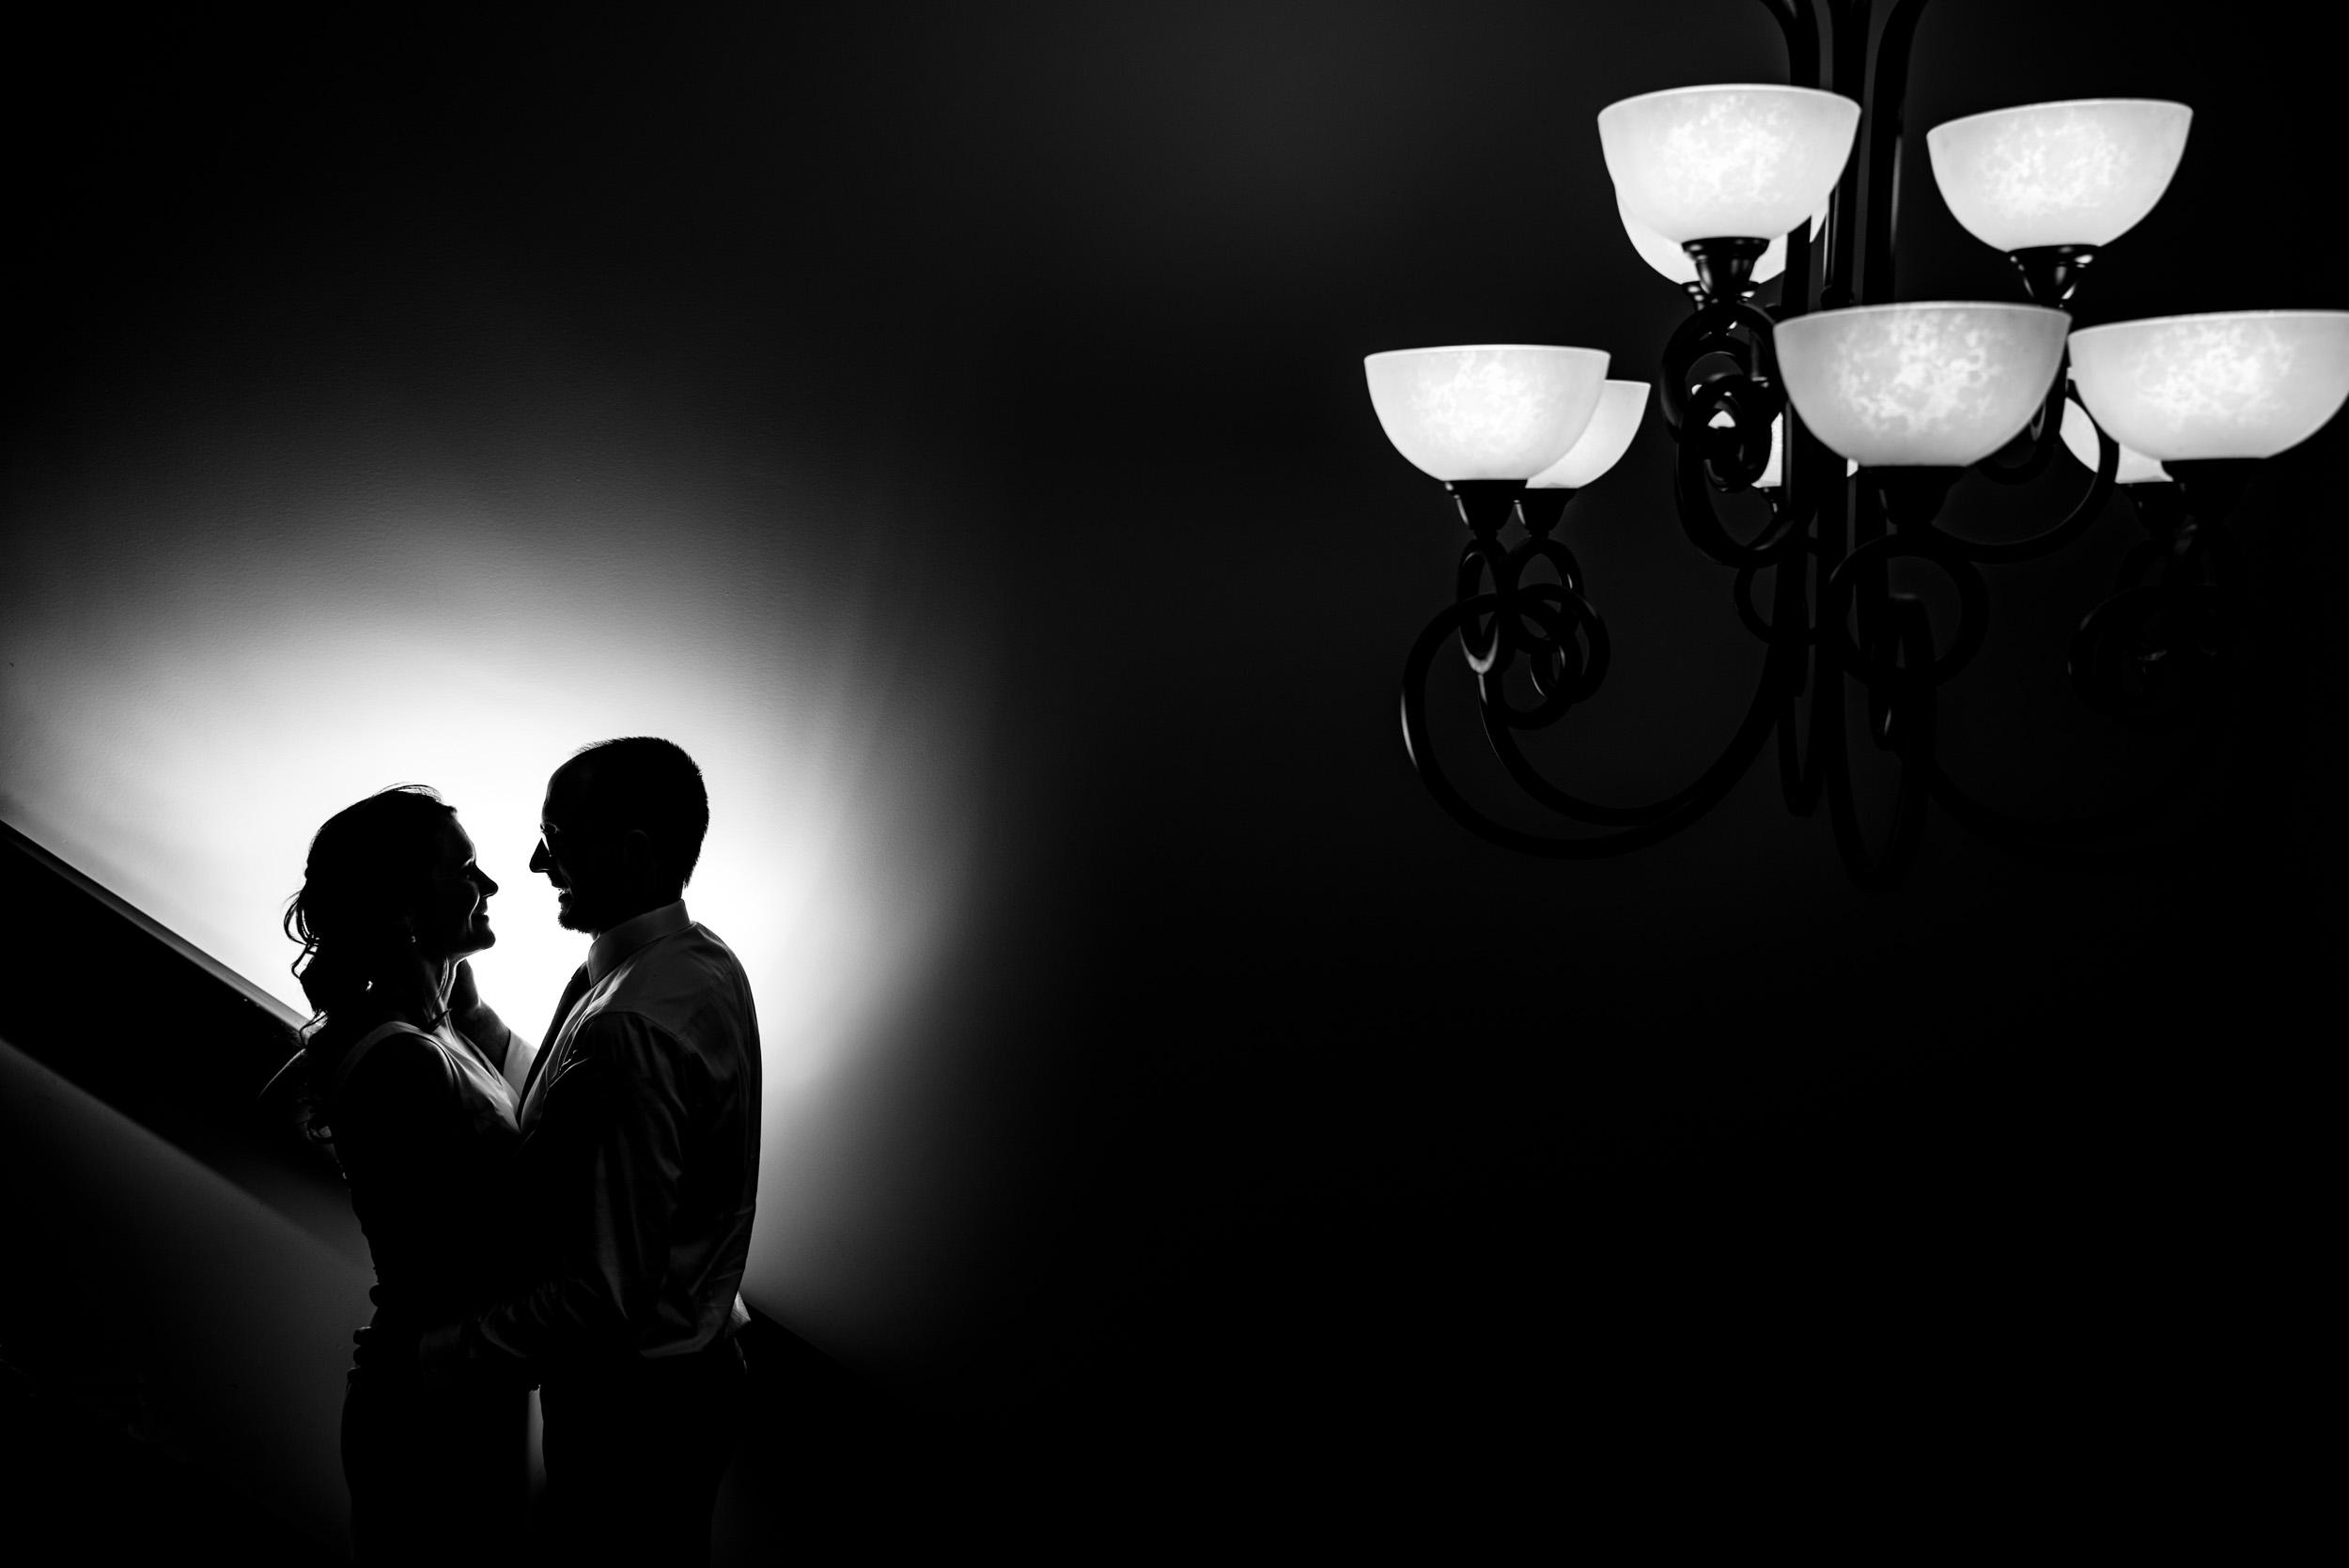 toronto-london-ontario-wedding-photographer-highland-country-club-artistic.jpg